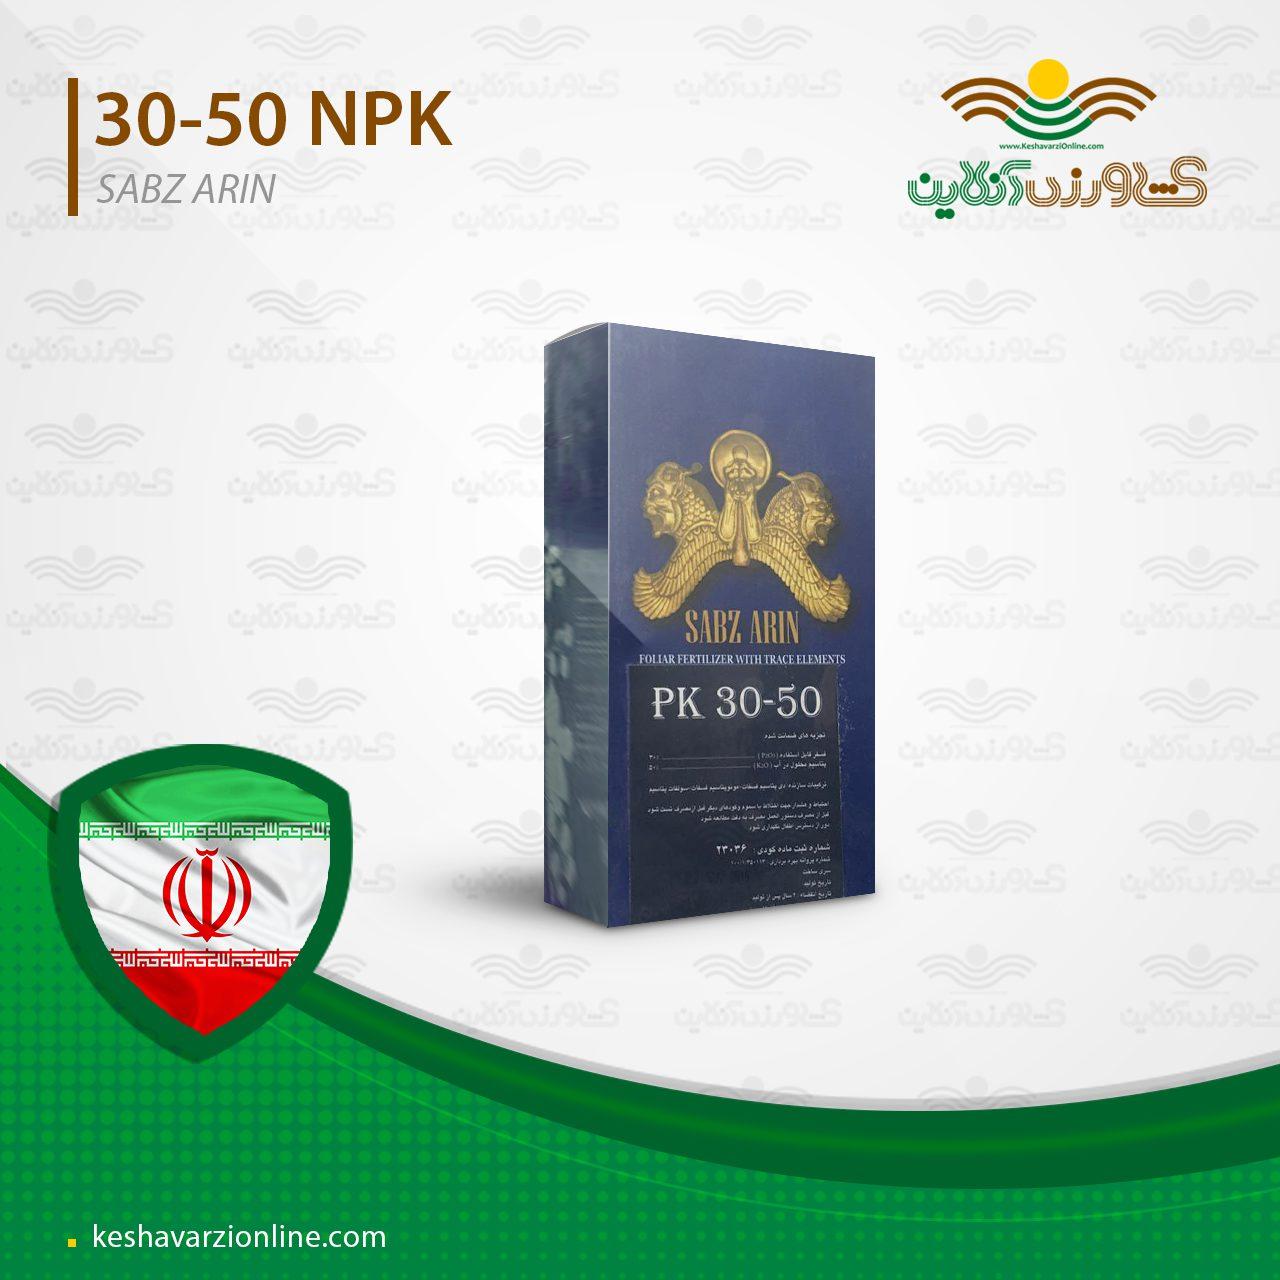 کود پی کی فسفر و پتاس ایرانی 30.50 سبز آرین